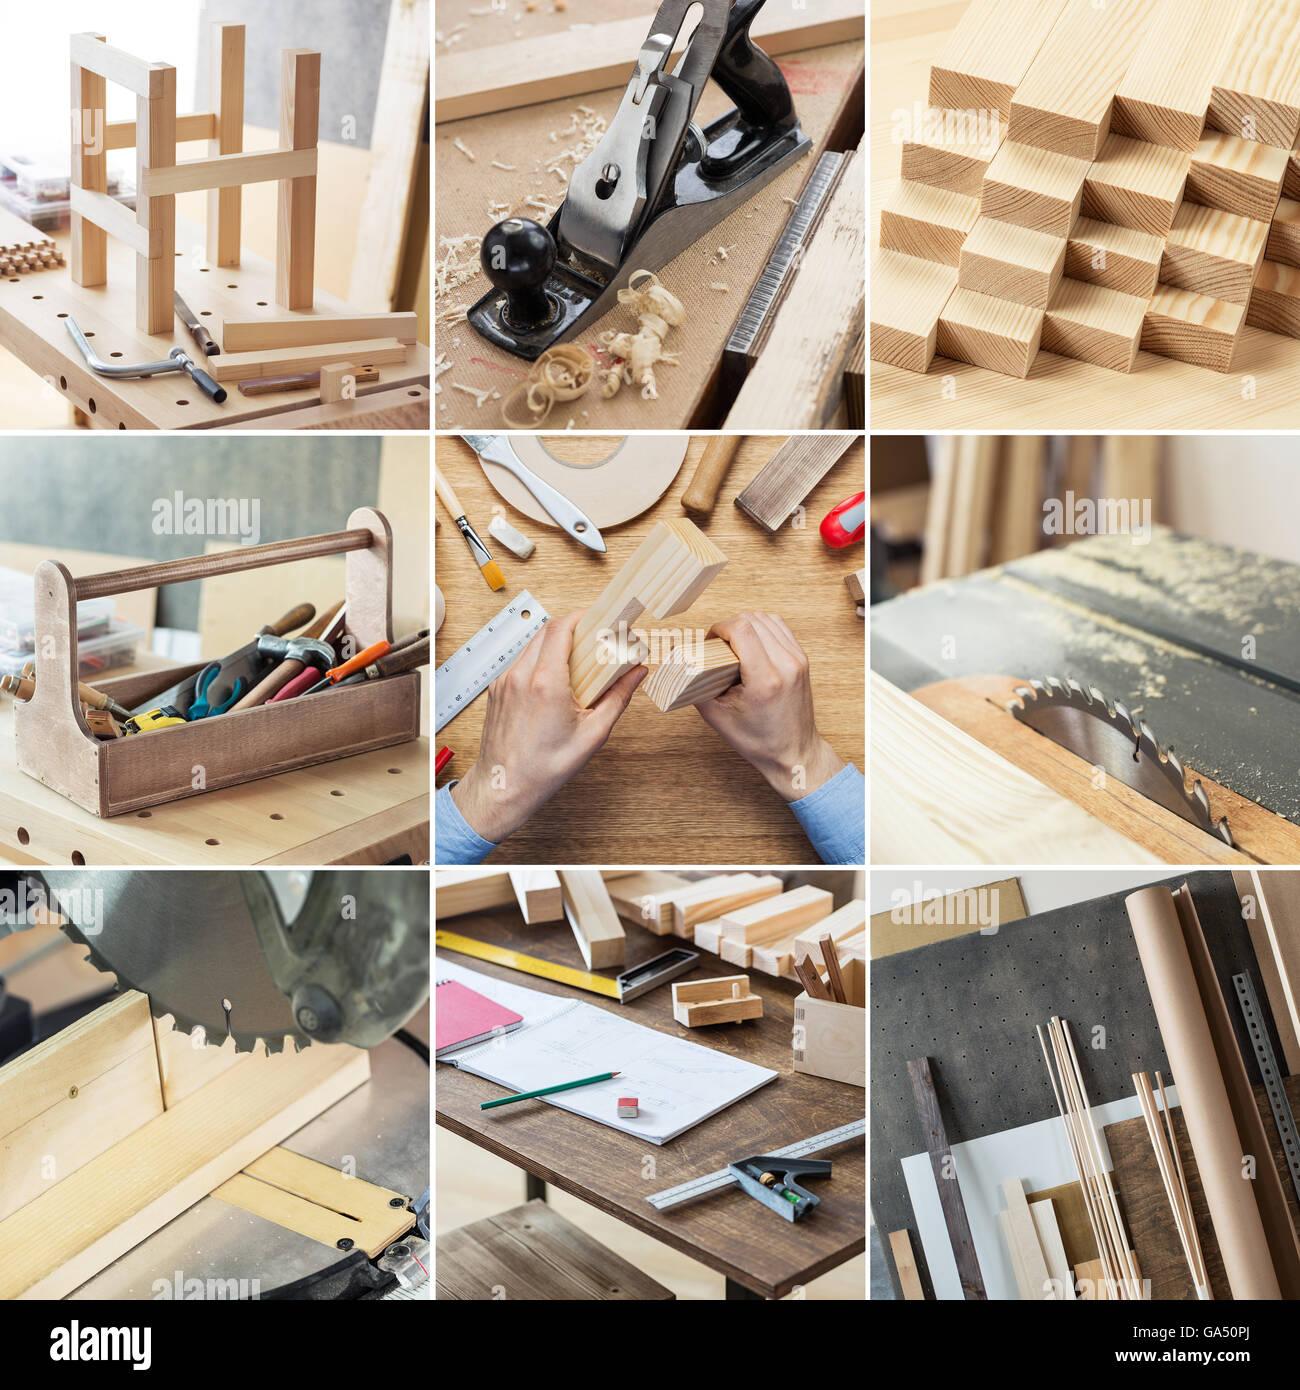 Various Woodworking Carpentry Repairing Diy Tools And Supplies In